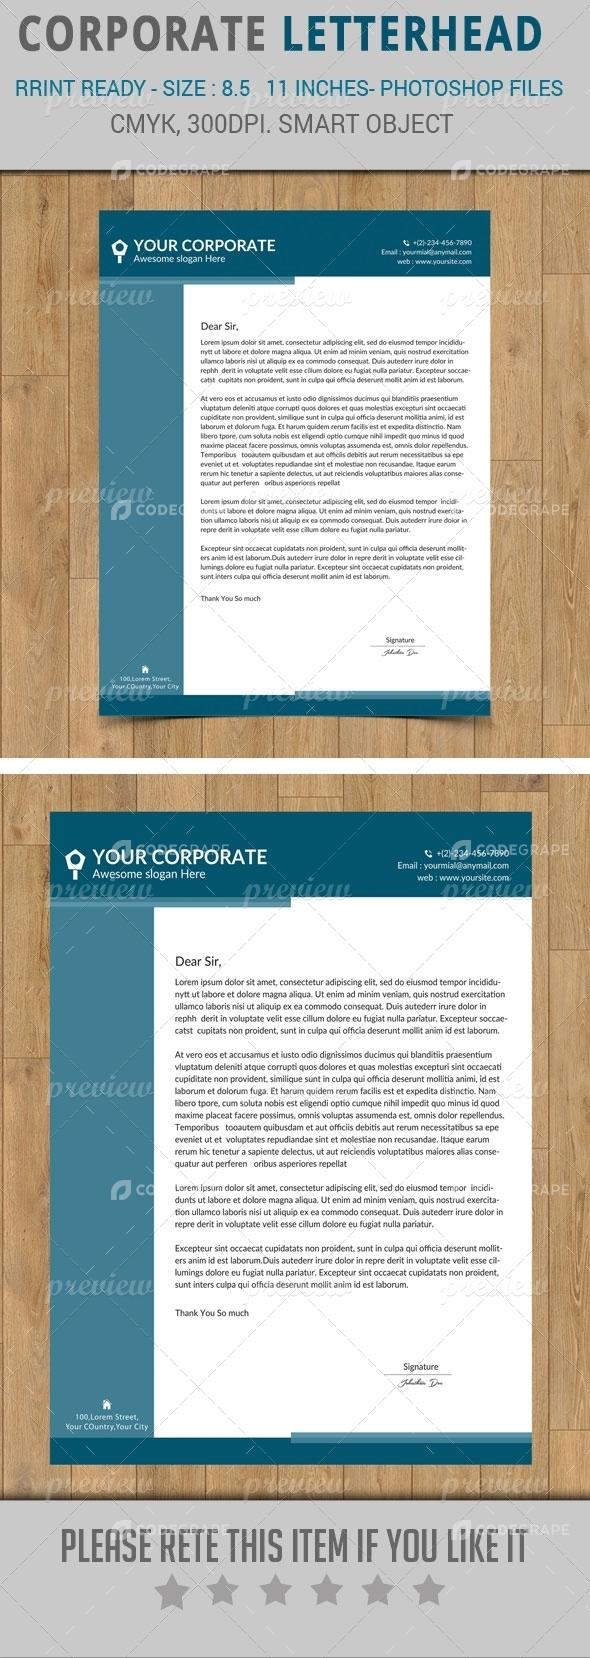 Corporate Letter Head Design